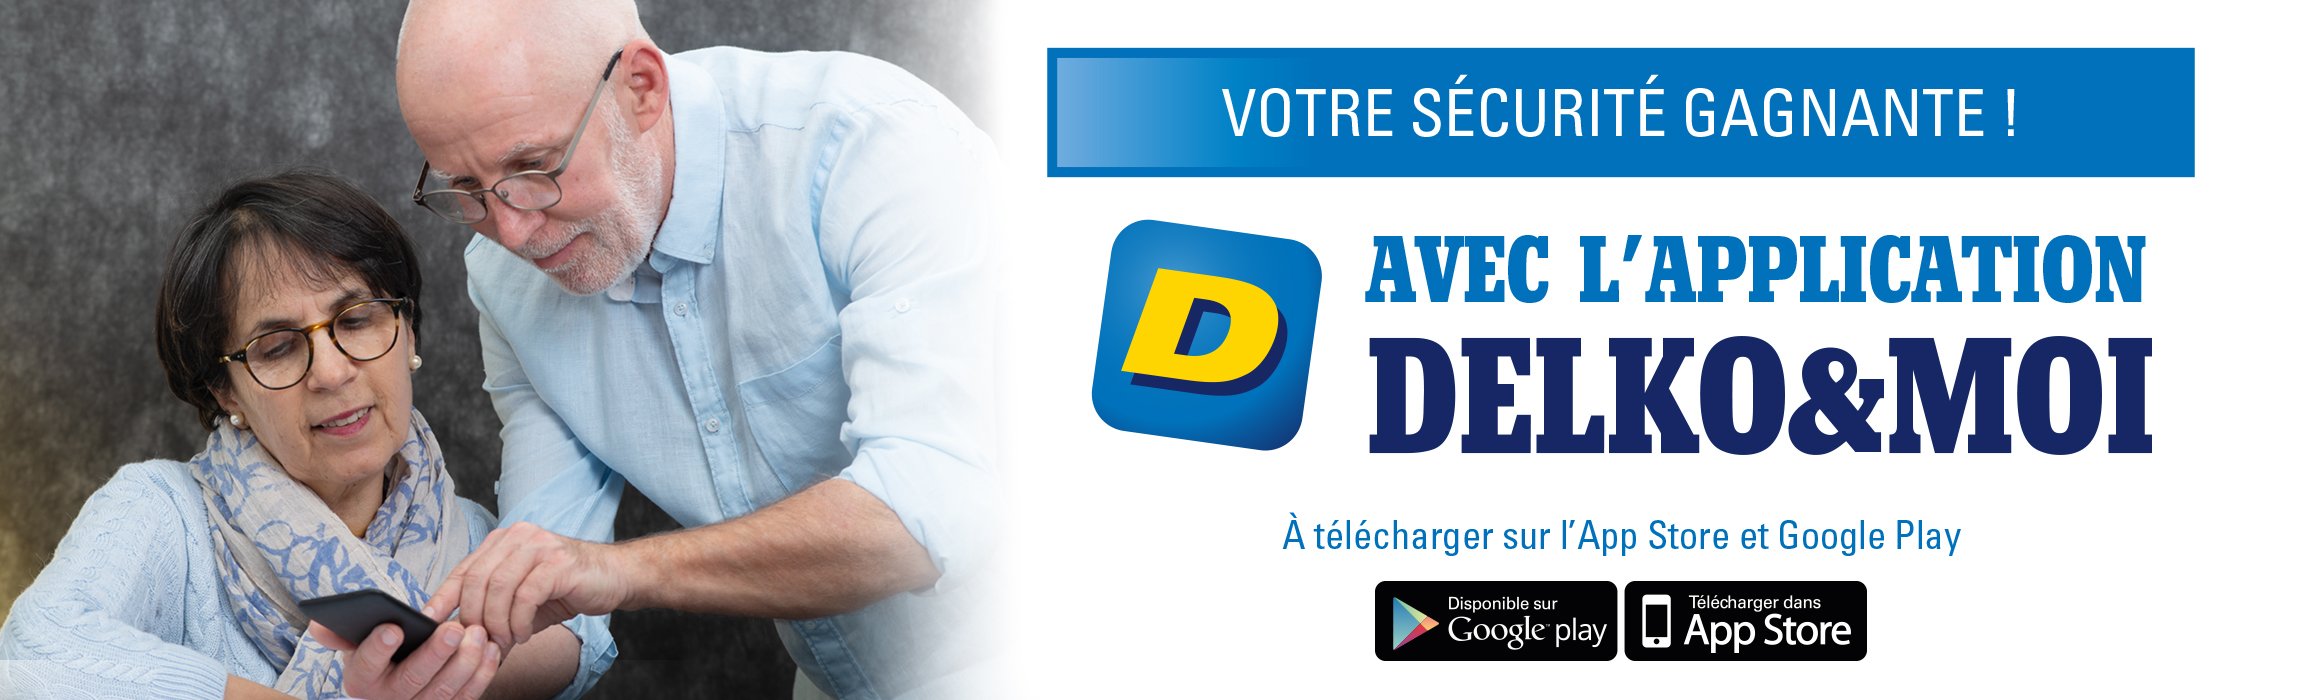 Application Mobile Delko&Moi